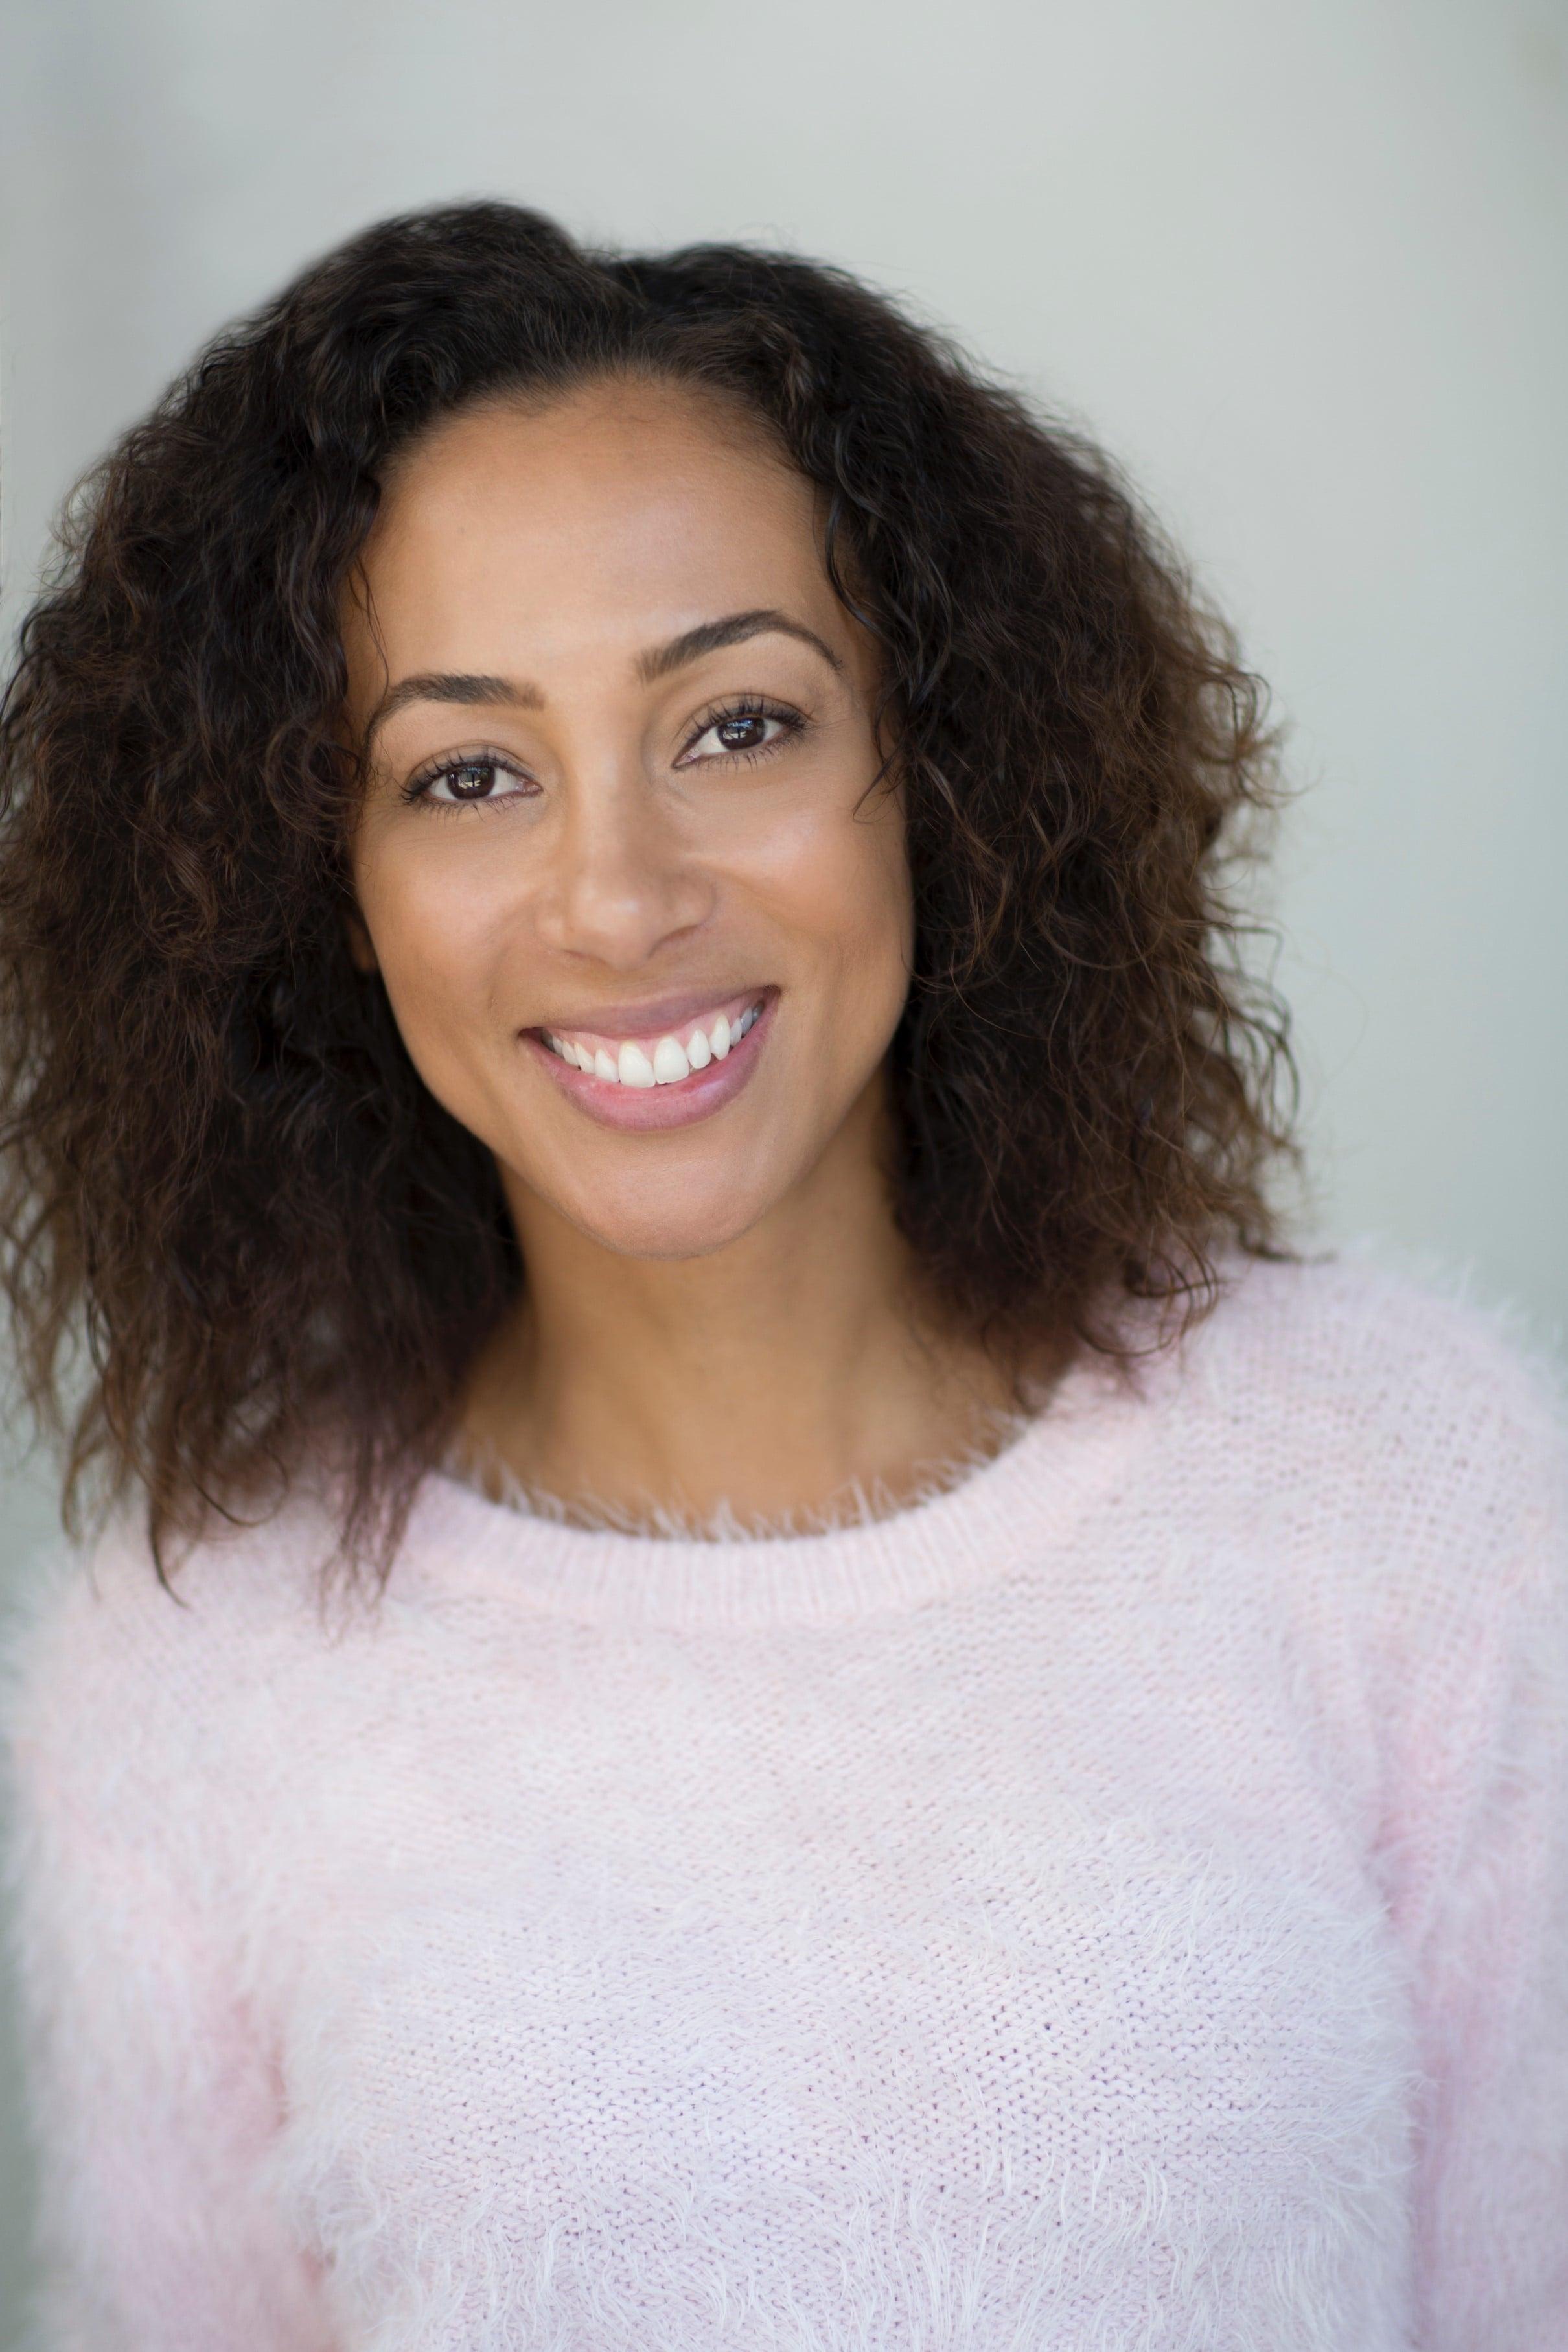 Sarah Akokhia BA – Community Development Officer & Drama Teacher